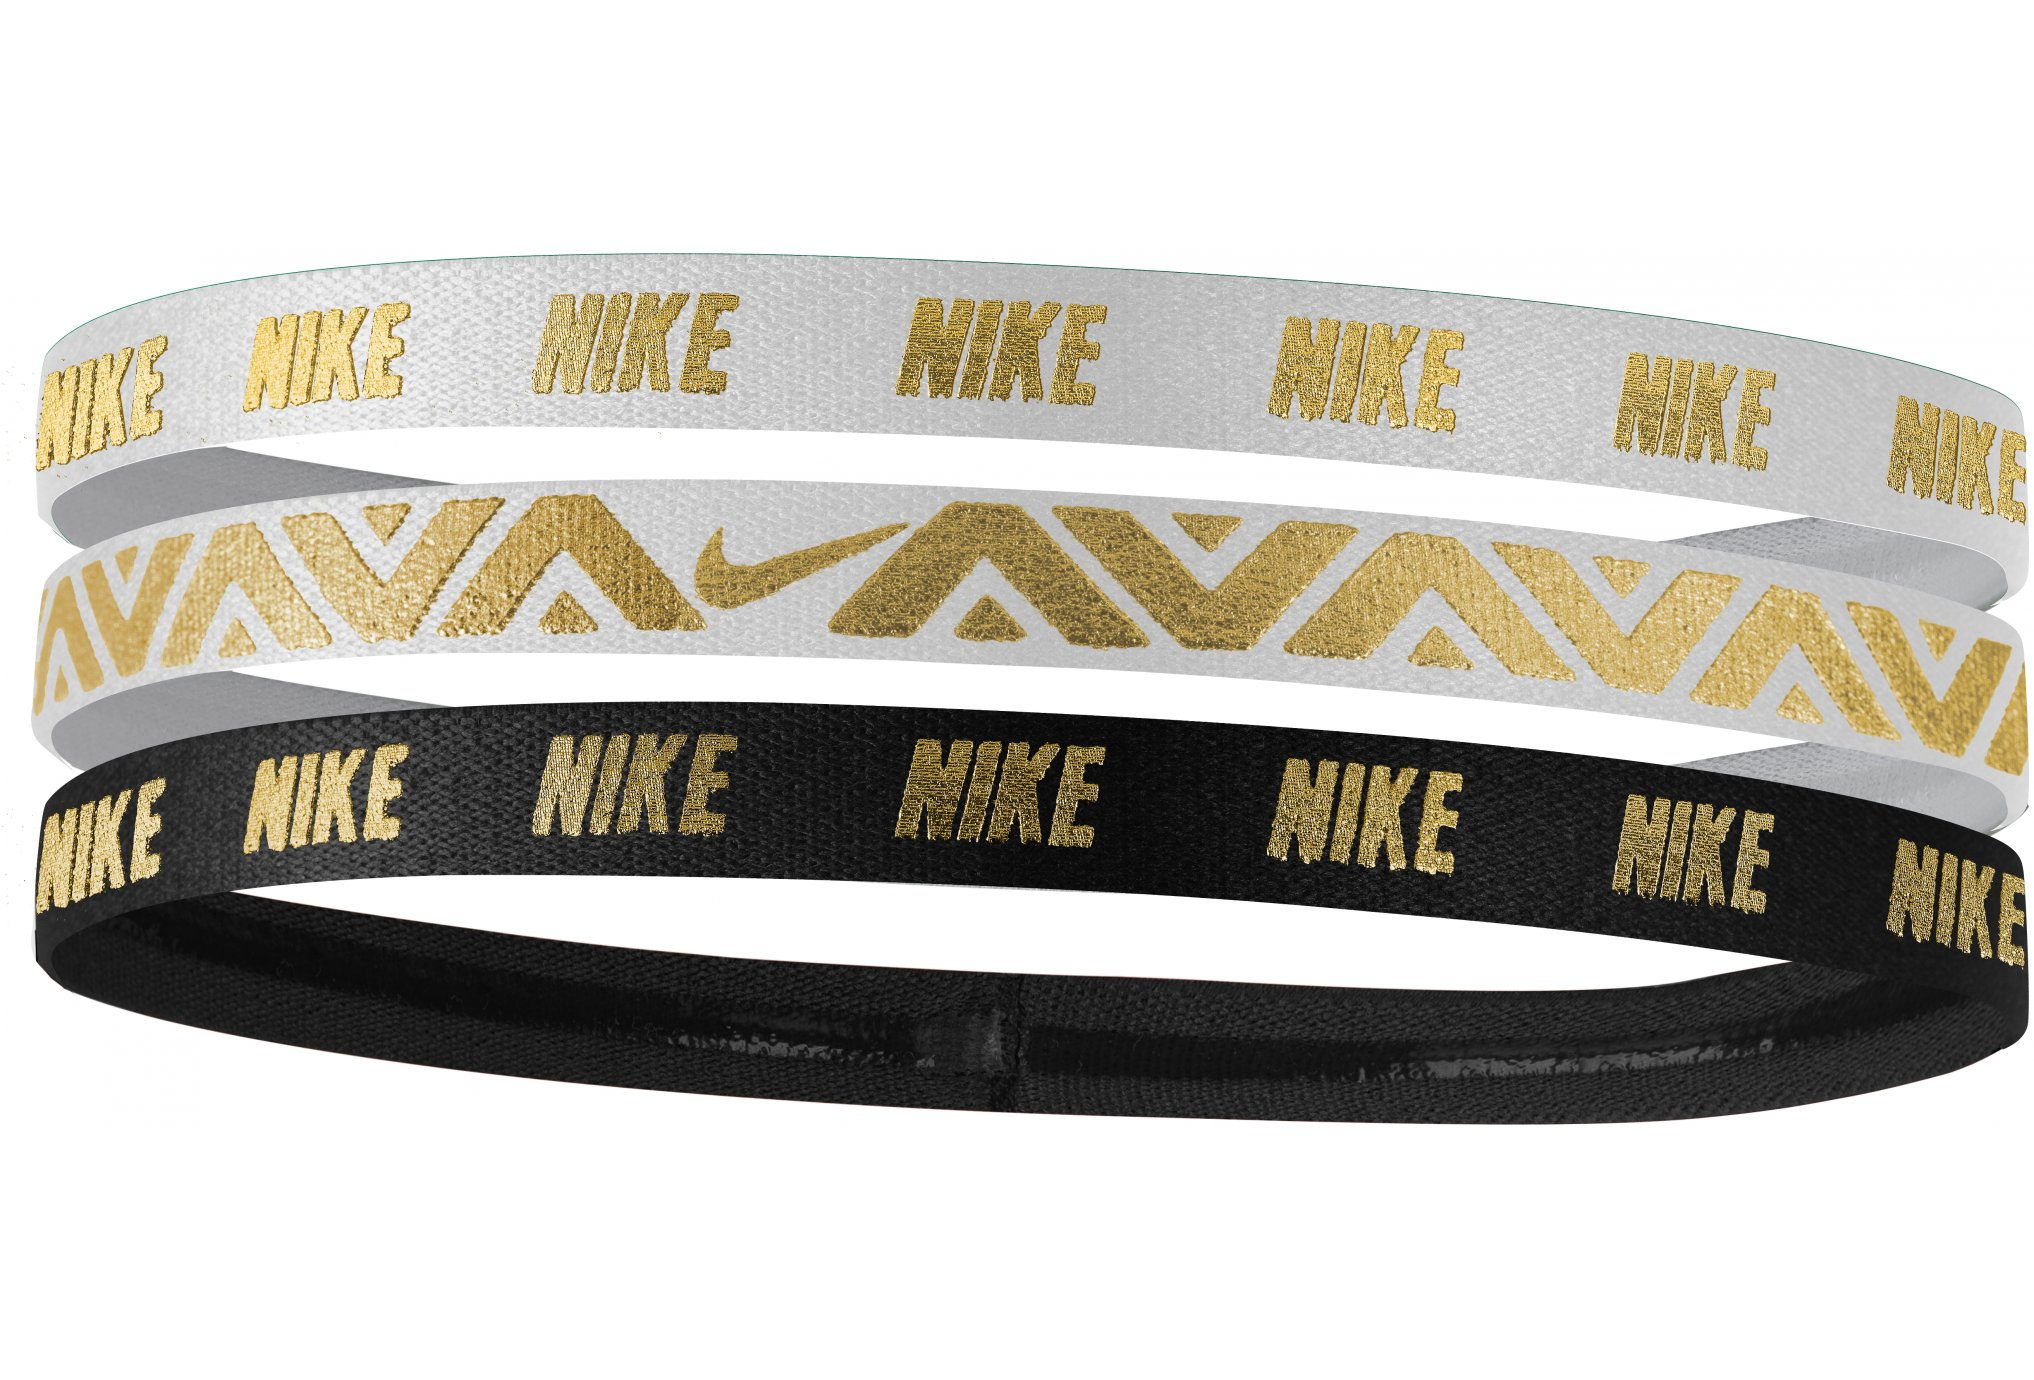 Nike Elastiques Hairband Metallic x3 Casquettes / bandeaux